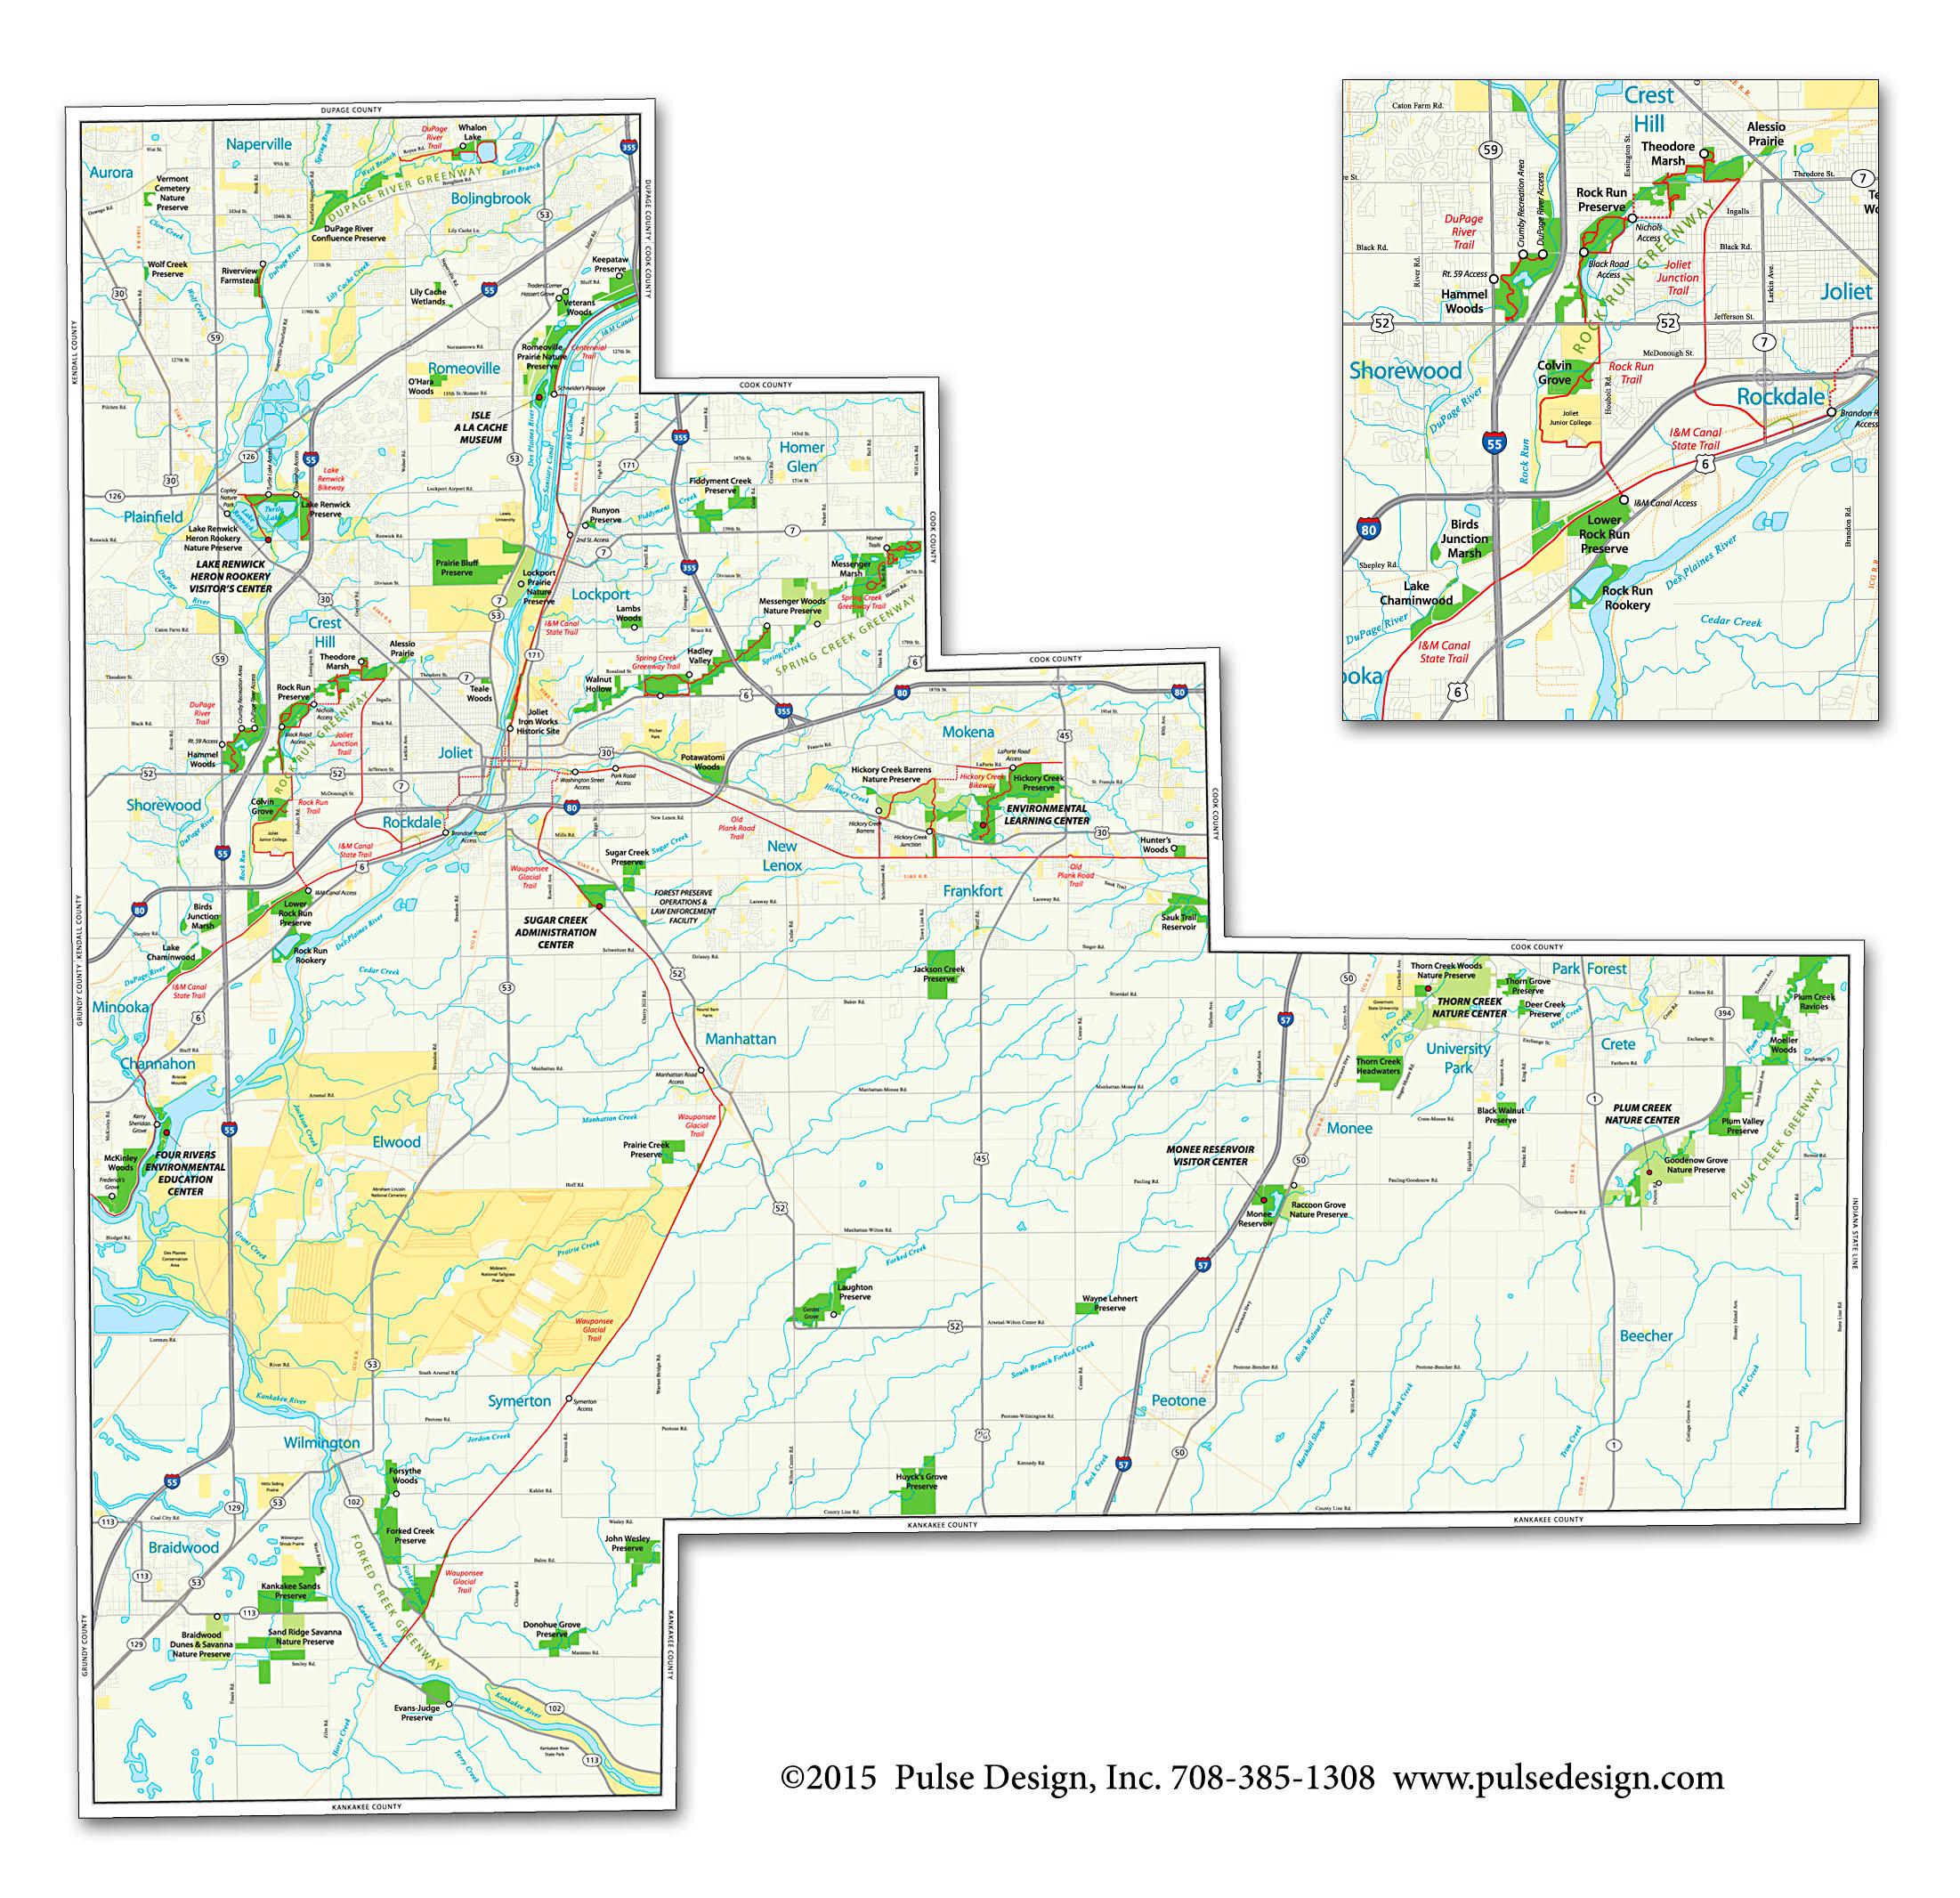 map-sugarcreek-wall-pulse-design-inc.jpg